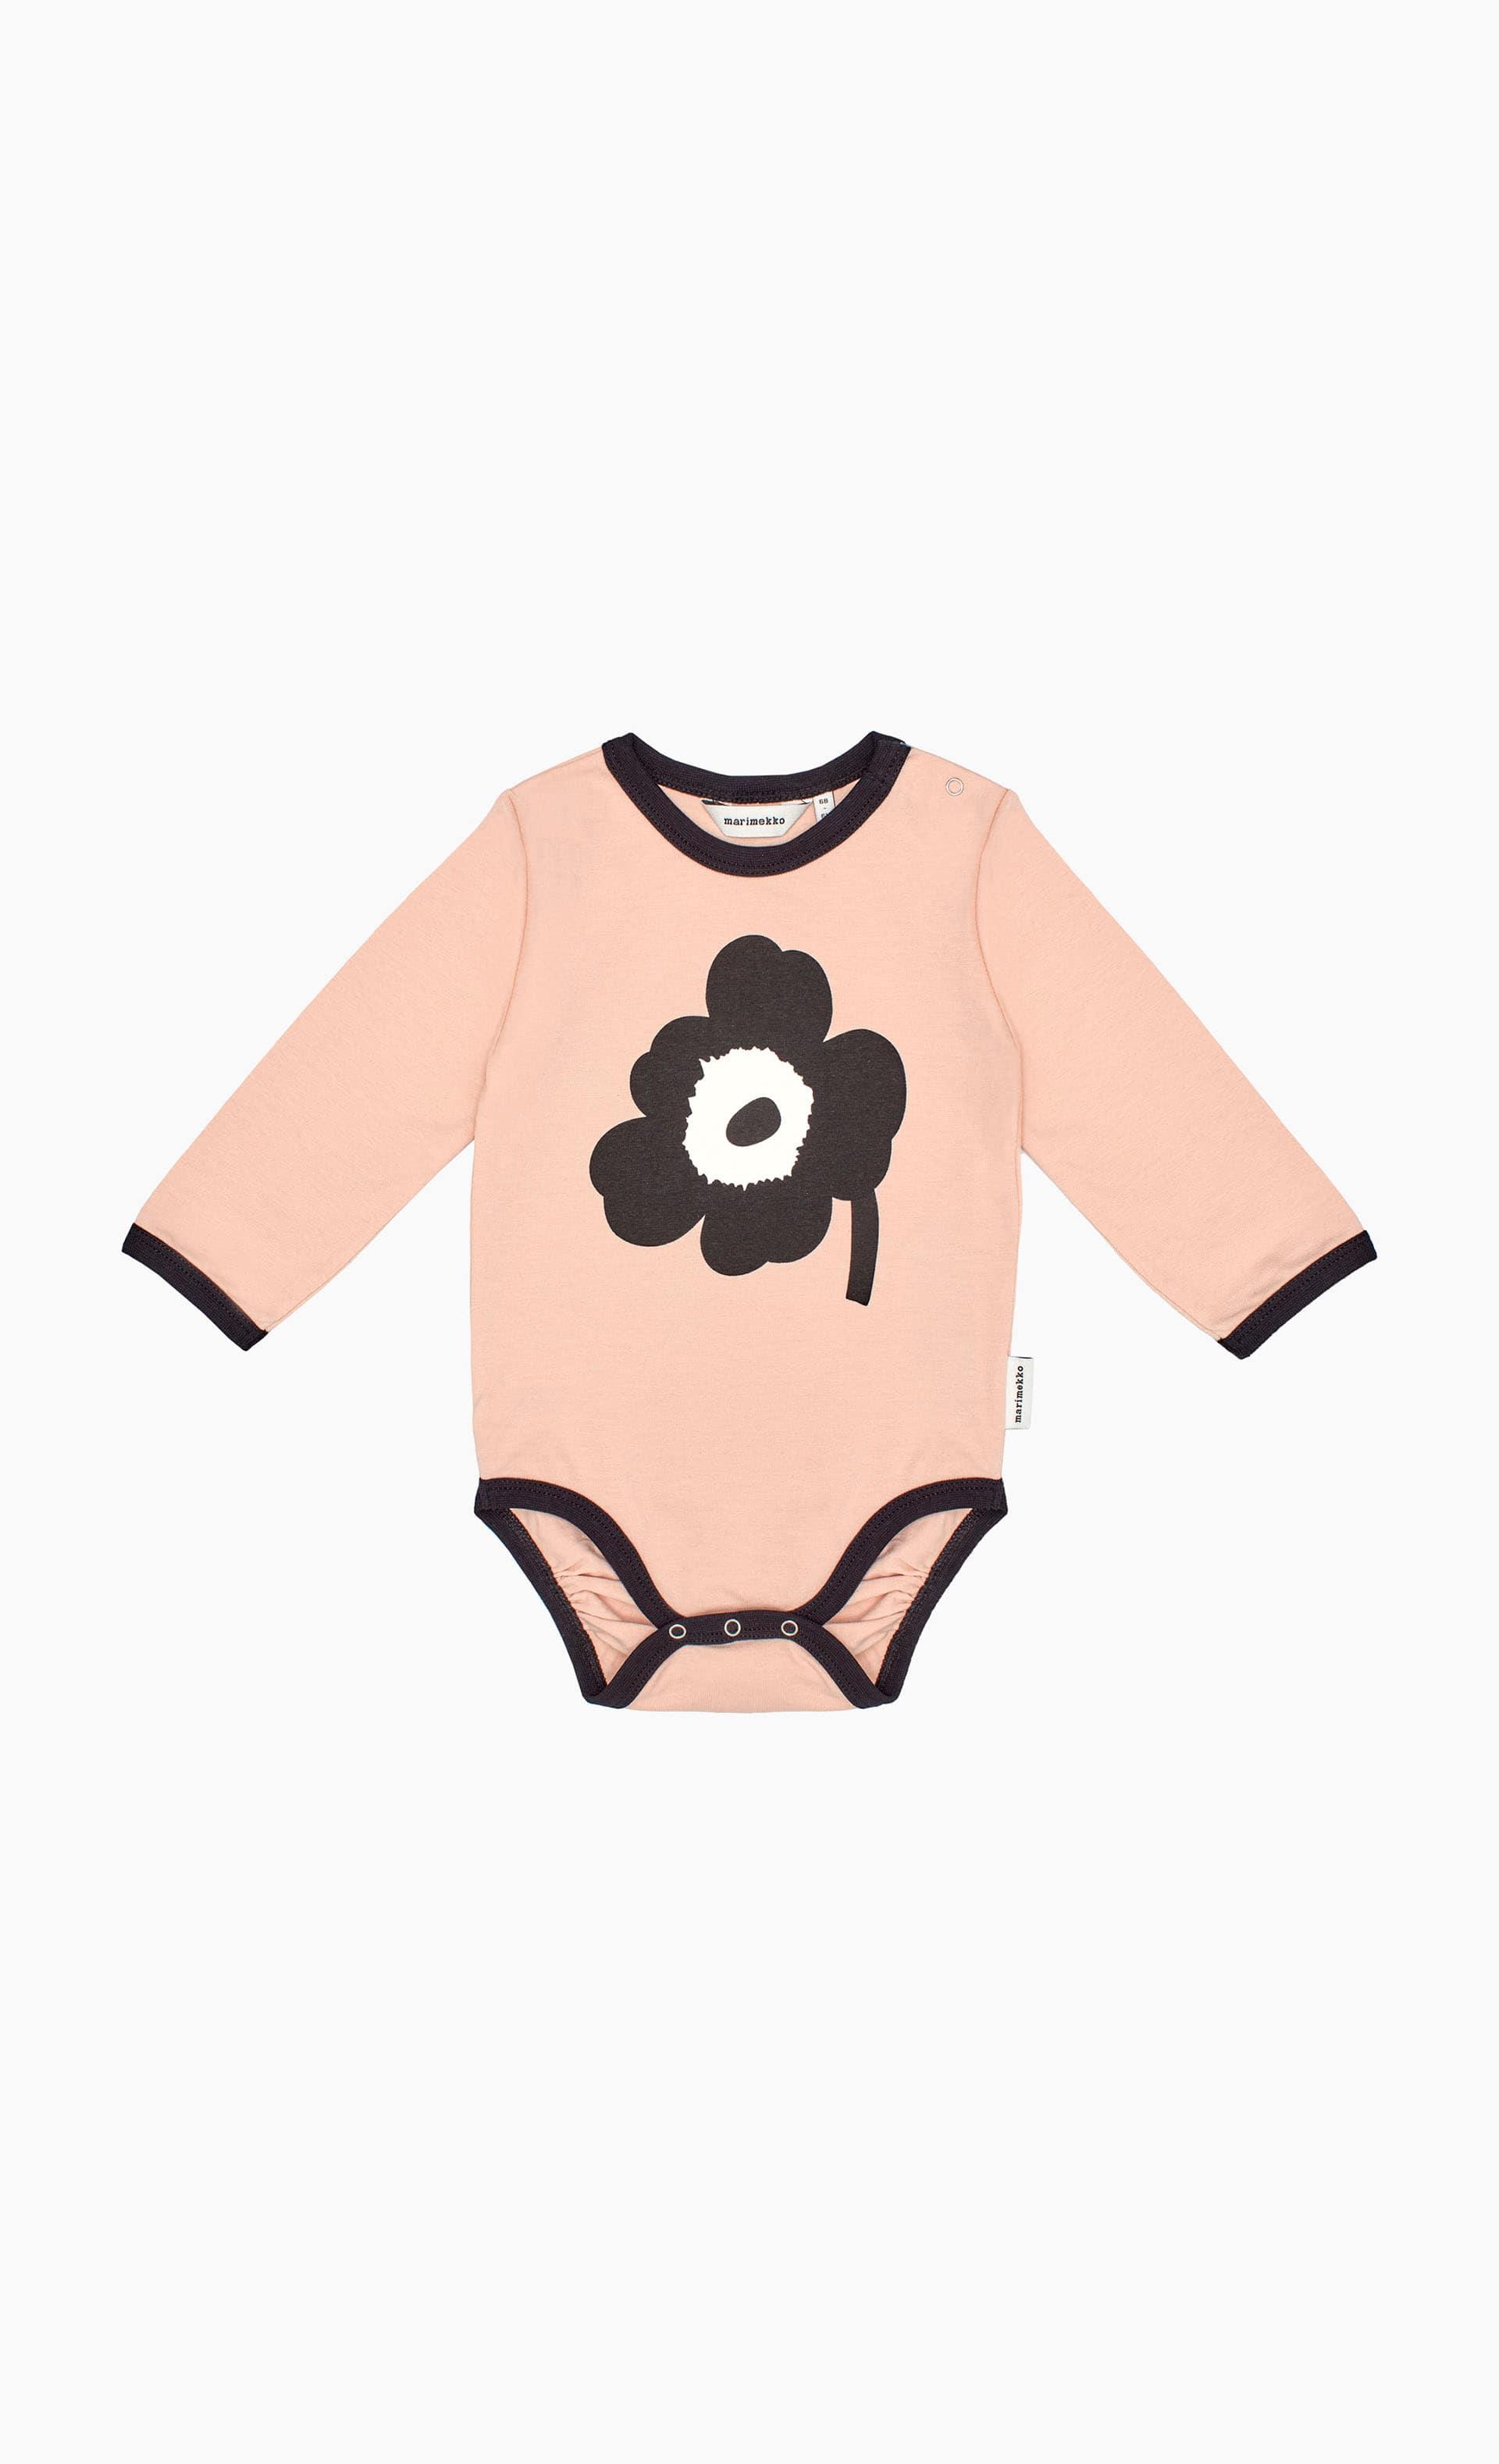 【Kids】Vinde Unikko Placement 長袖ロンパース